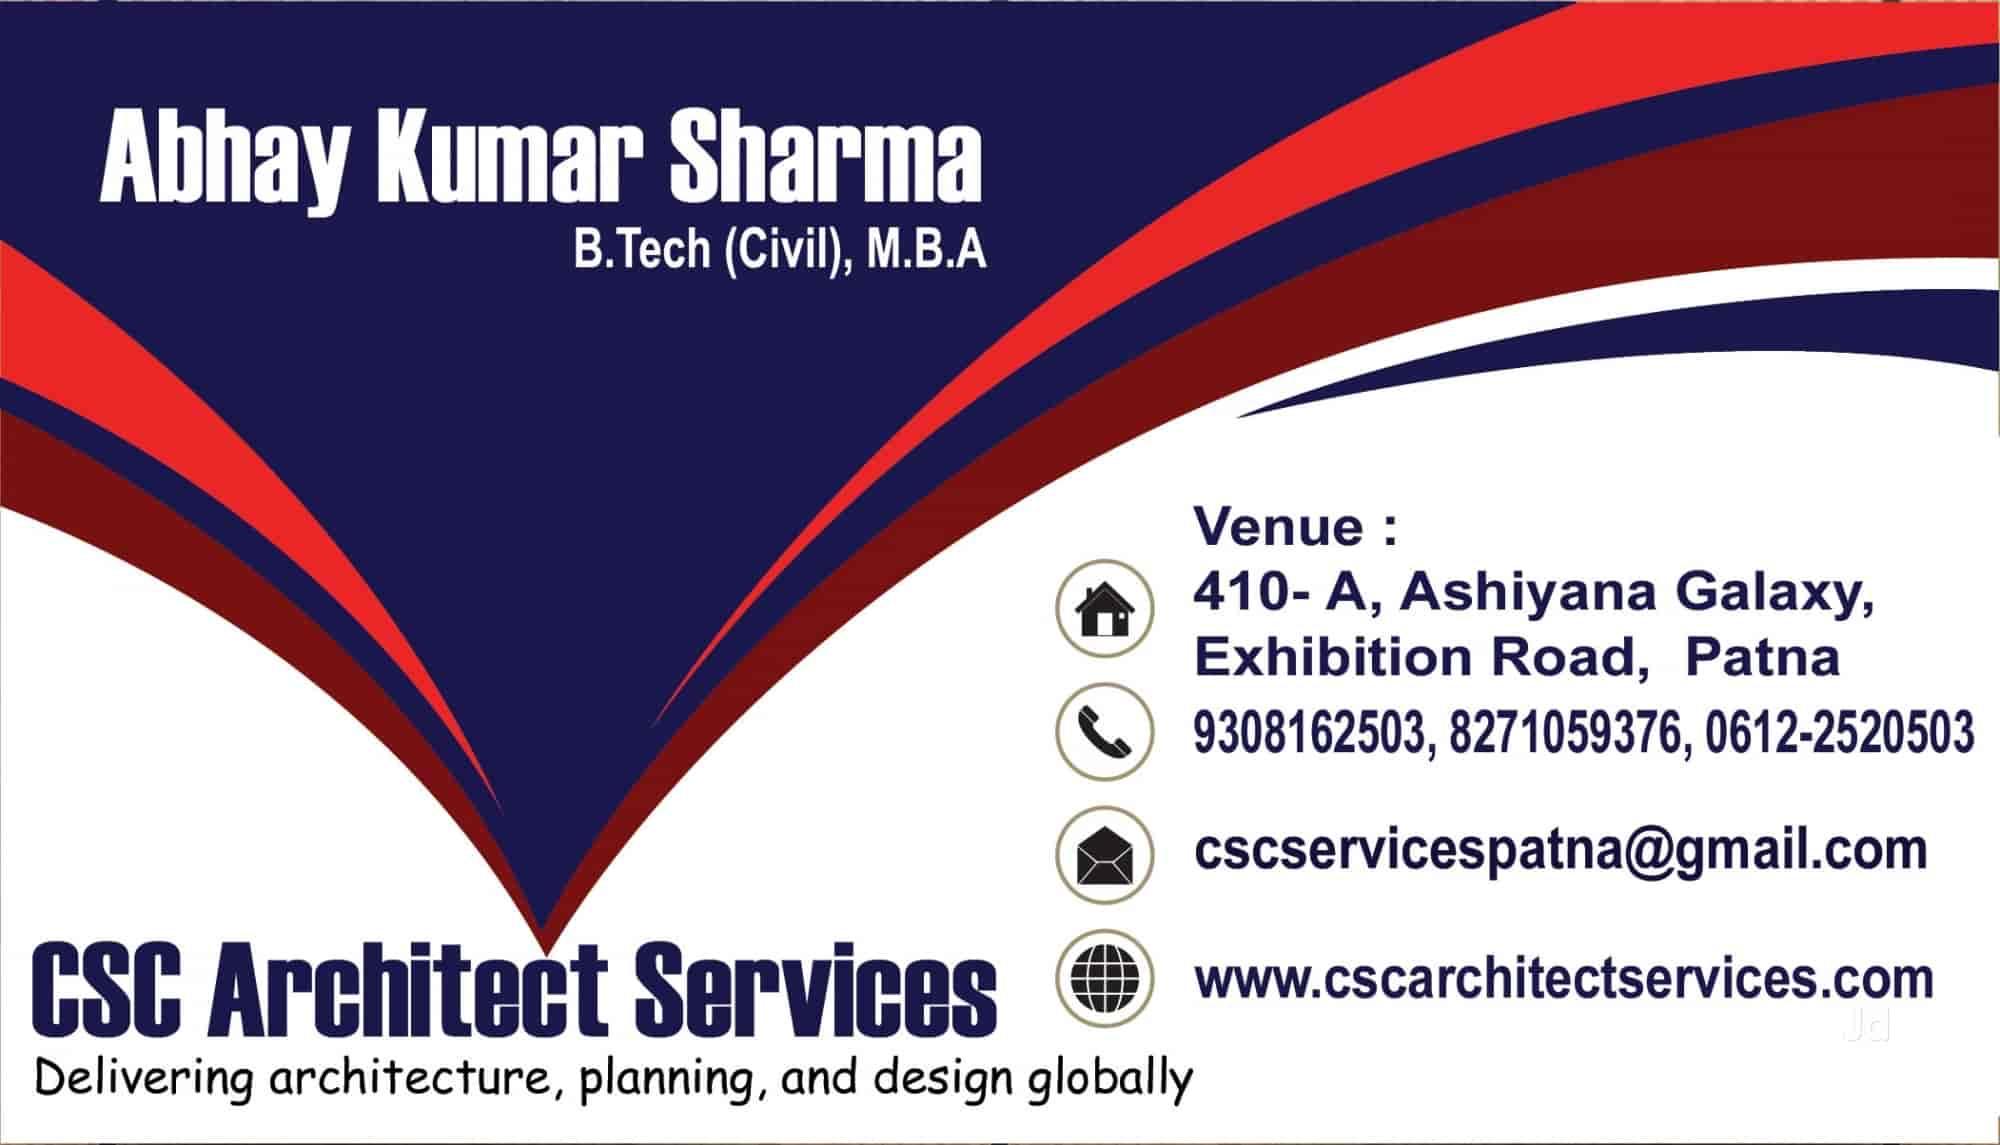 CSC Architect Services, Exhibition Road - Commercial